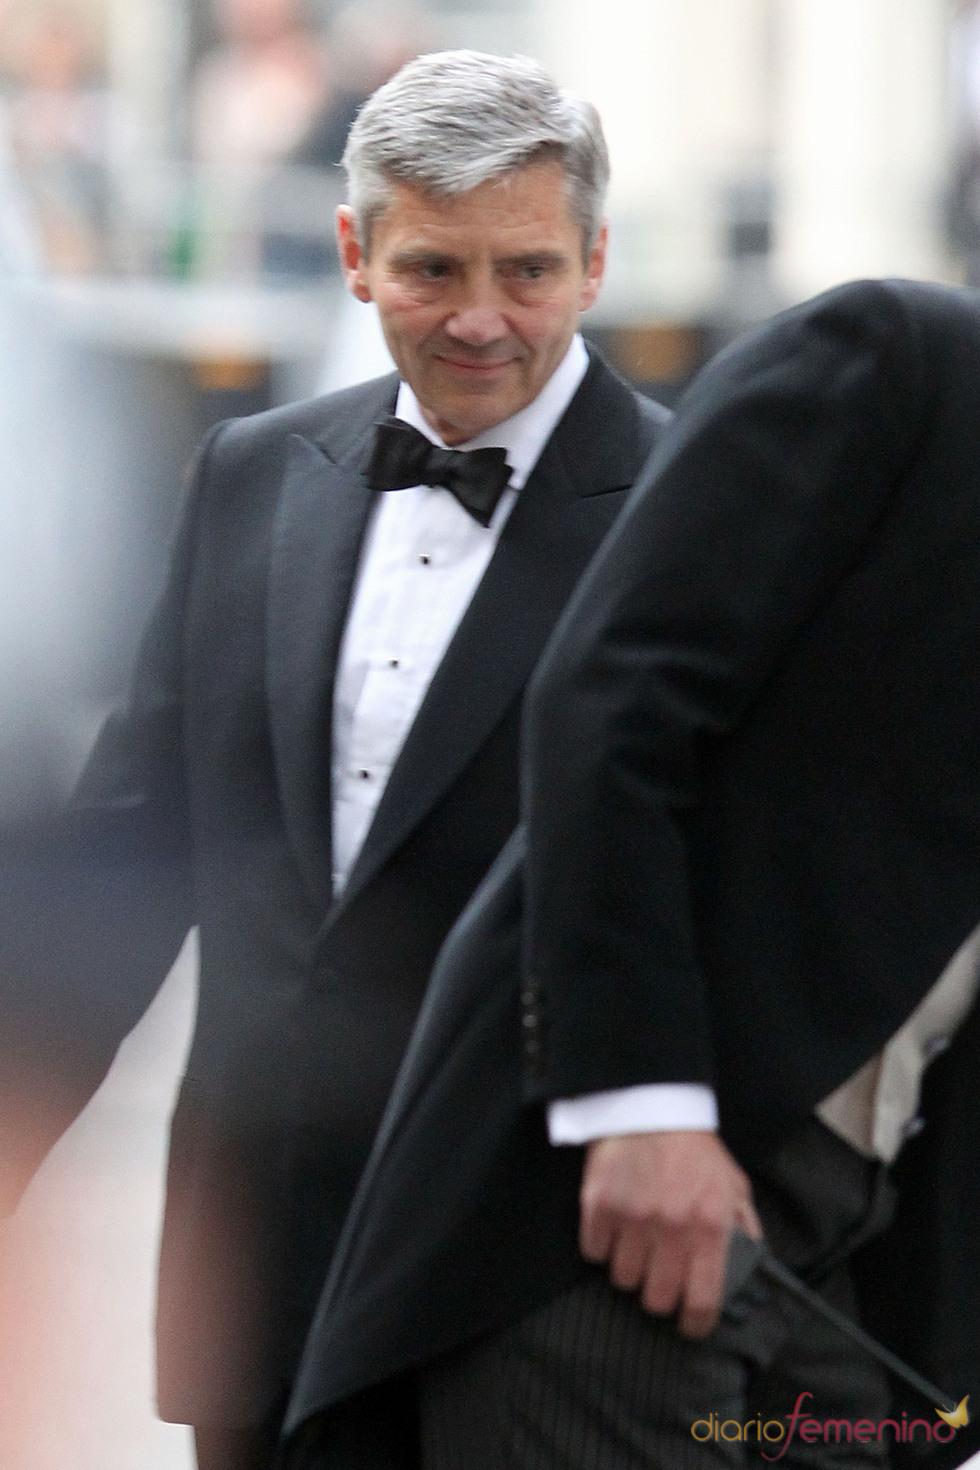 Michael Middleton en la fiesta privada de la Boda Real